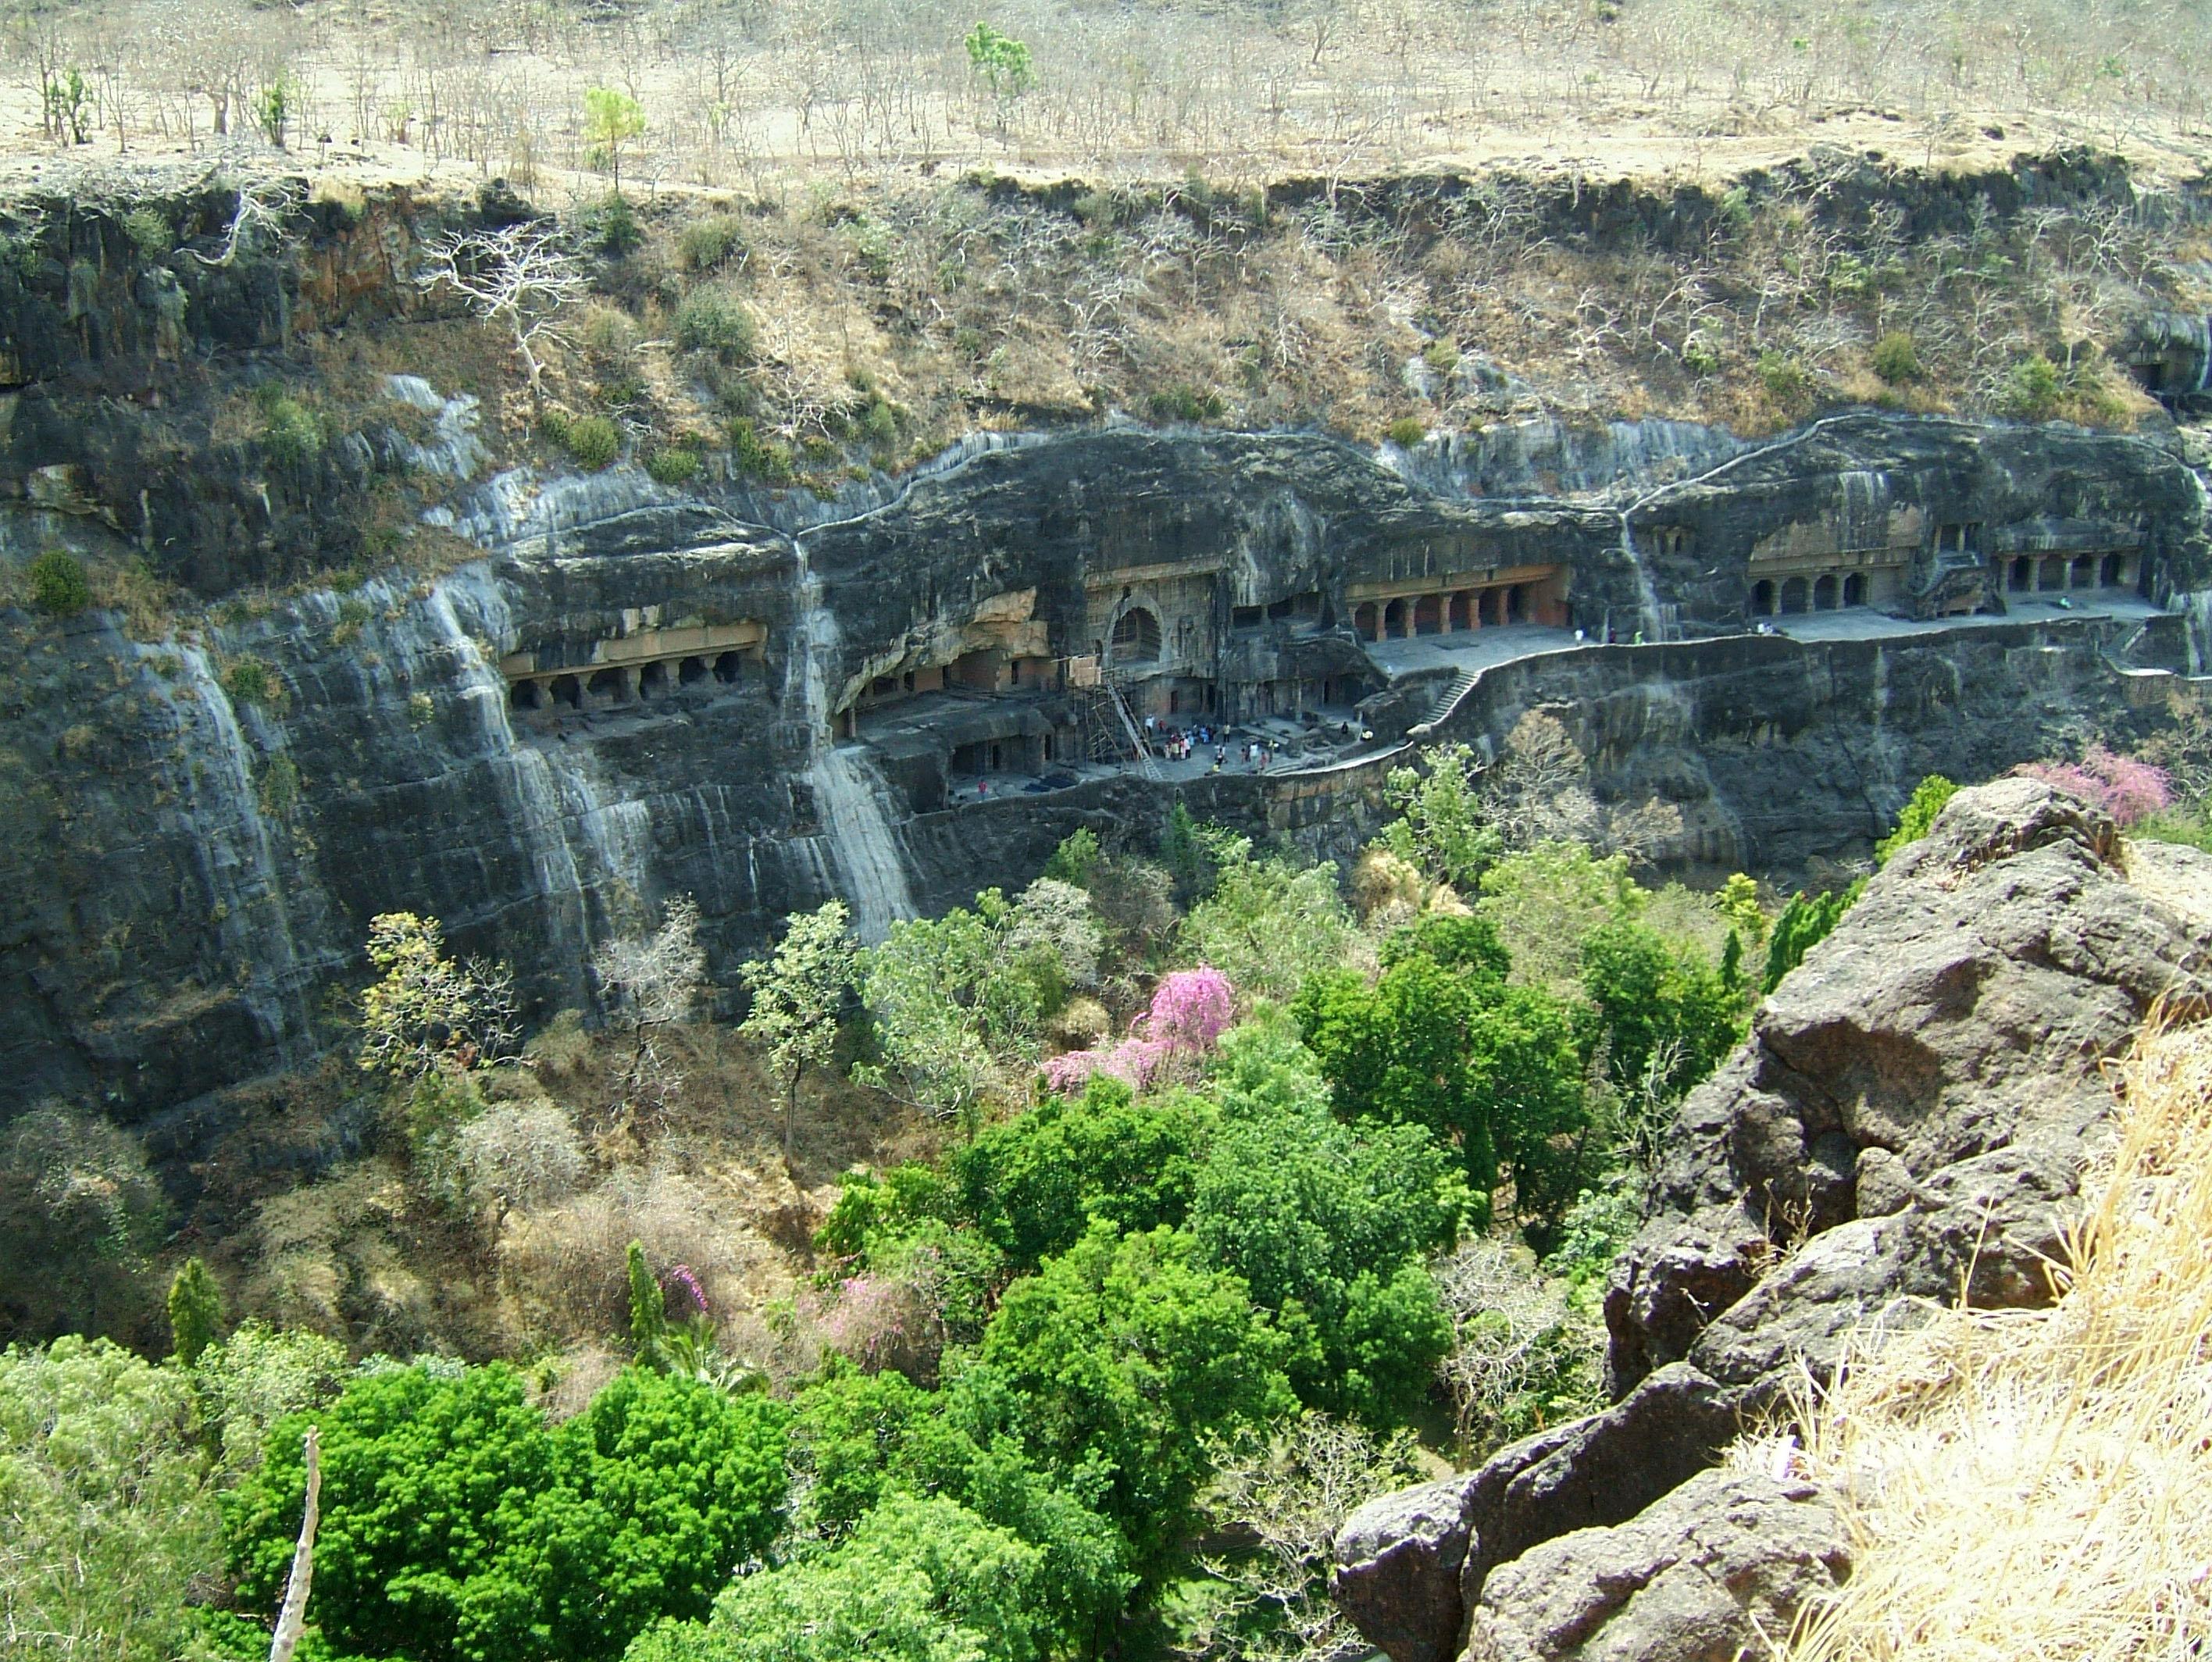 Marathwada Ajanta Caves entrance India Apr 2004 05